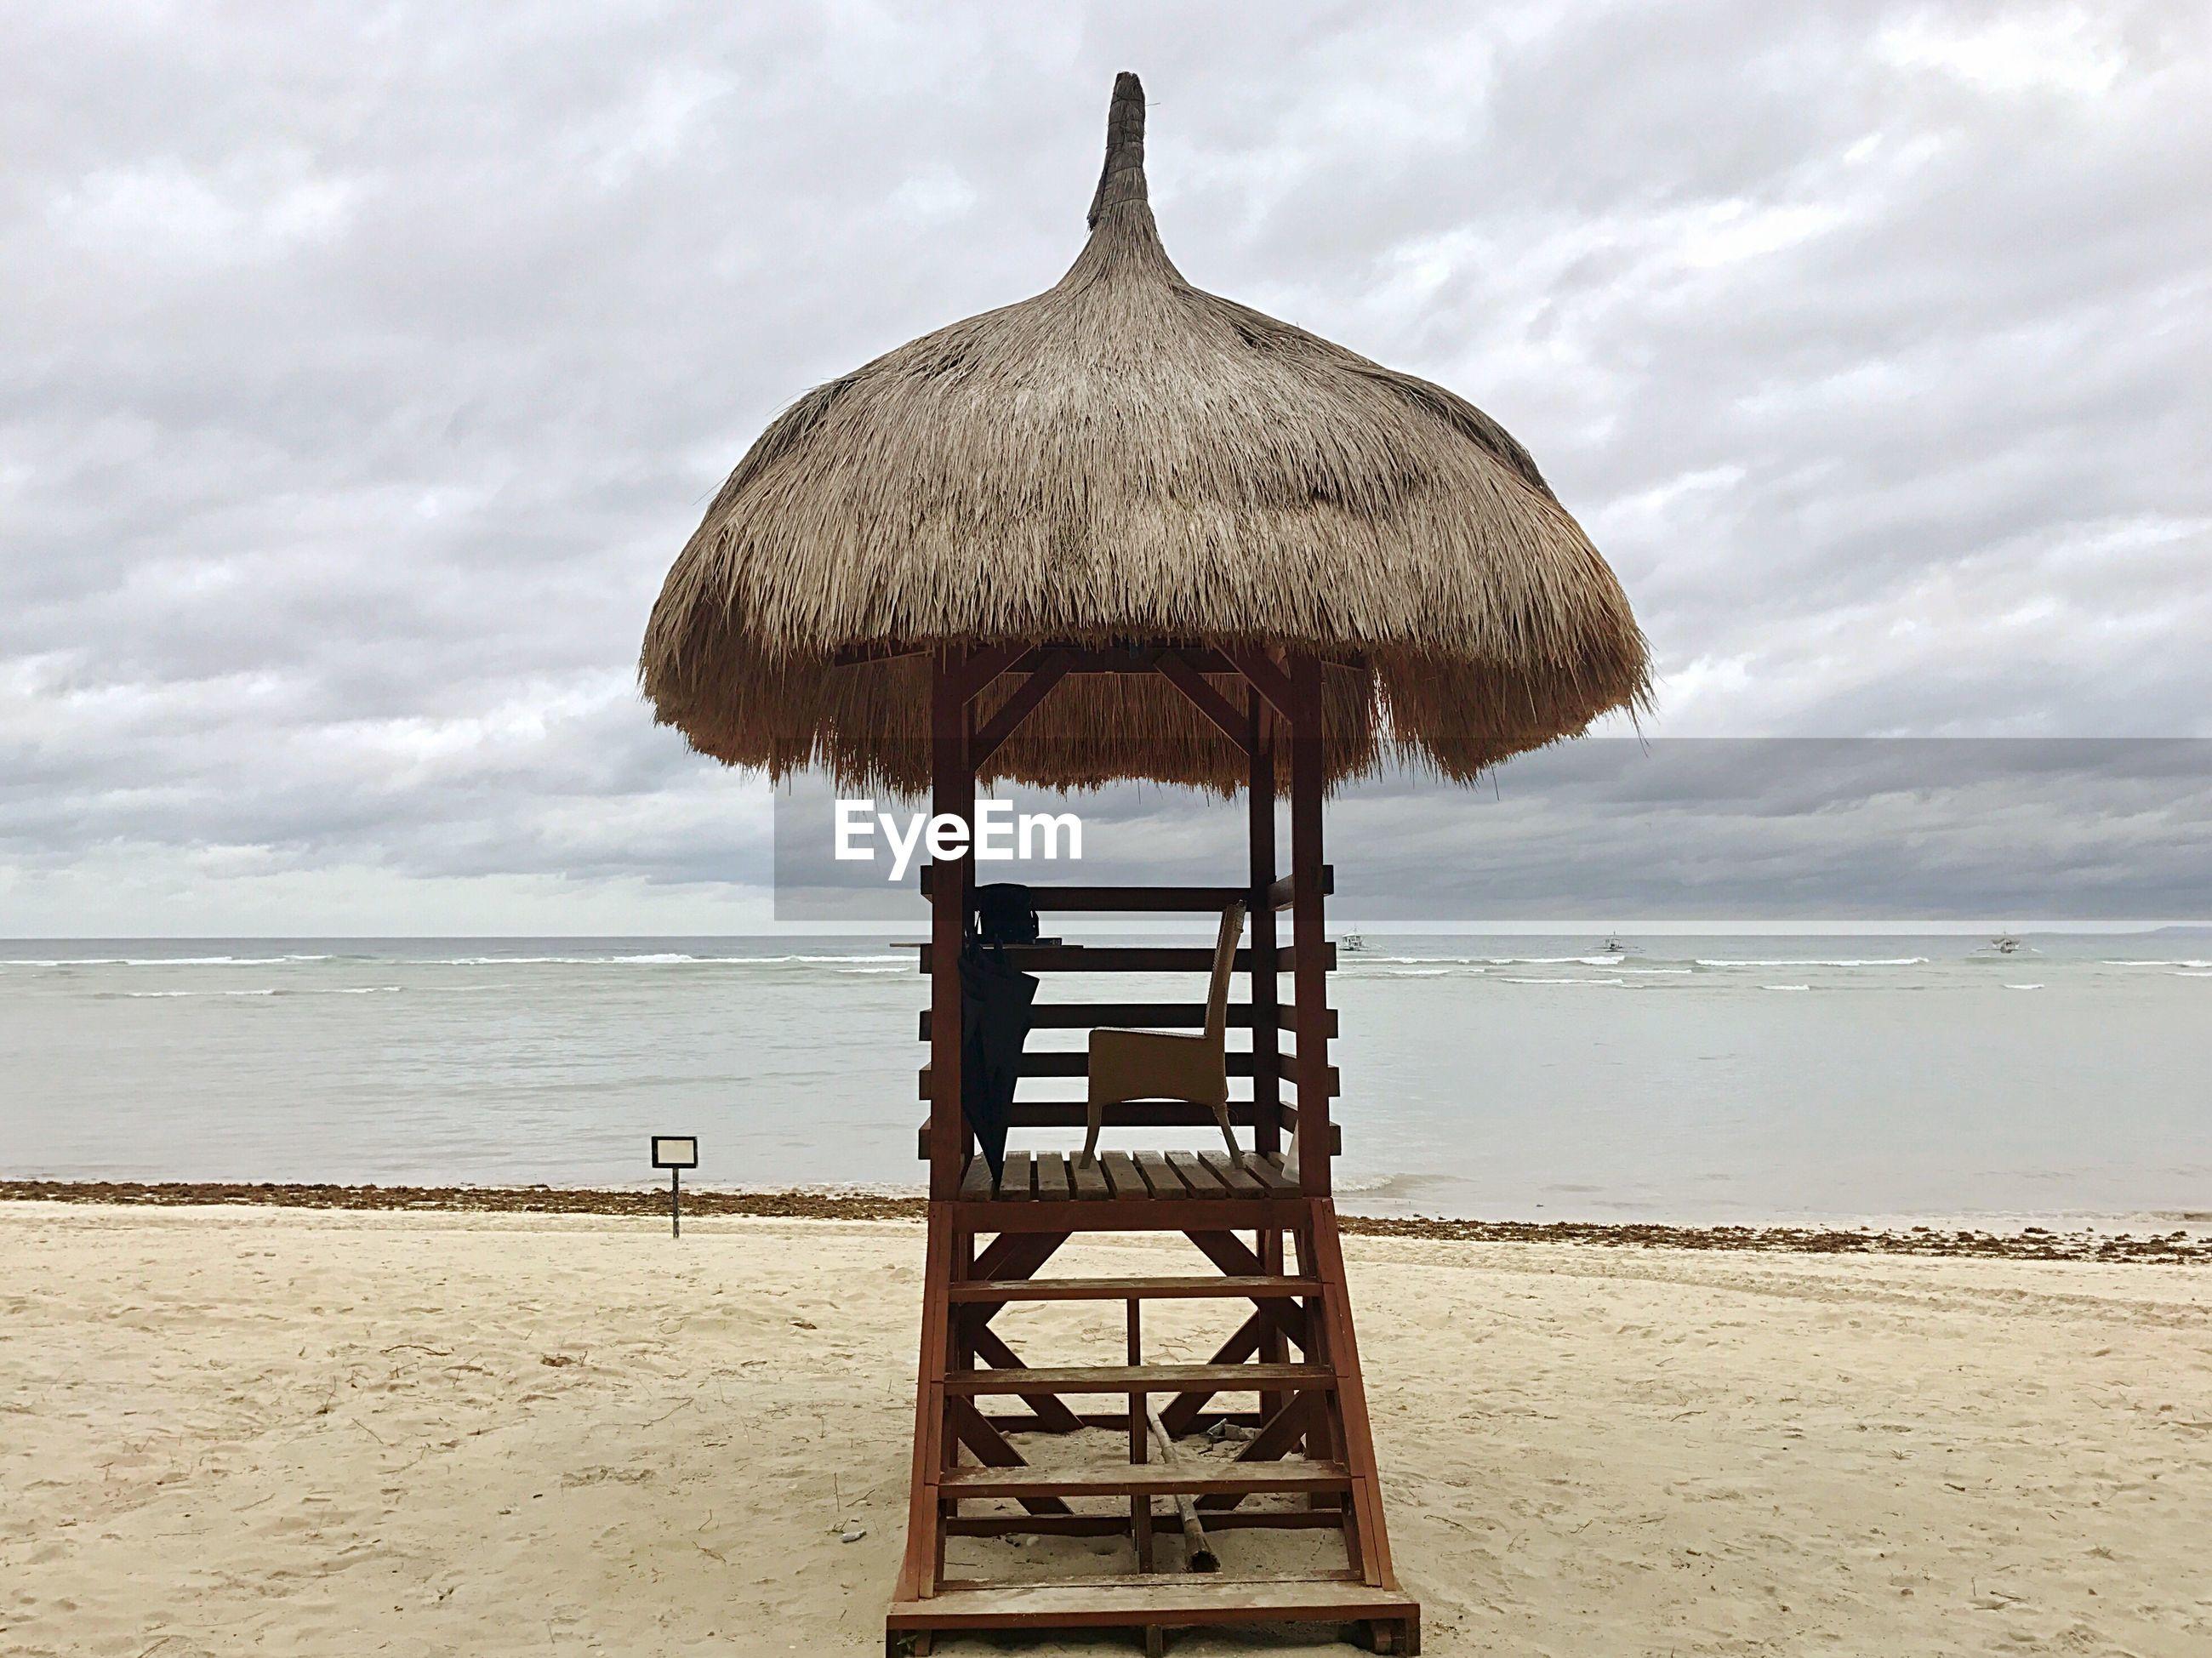 Lifeguard hut at beach against cloudy sky